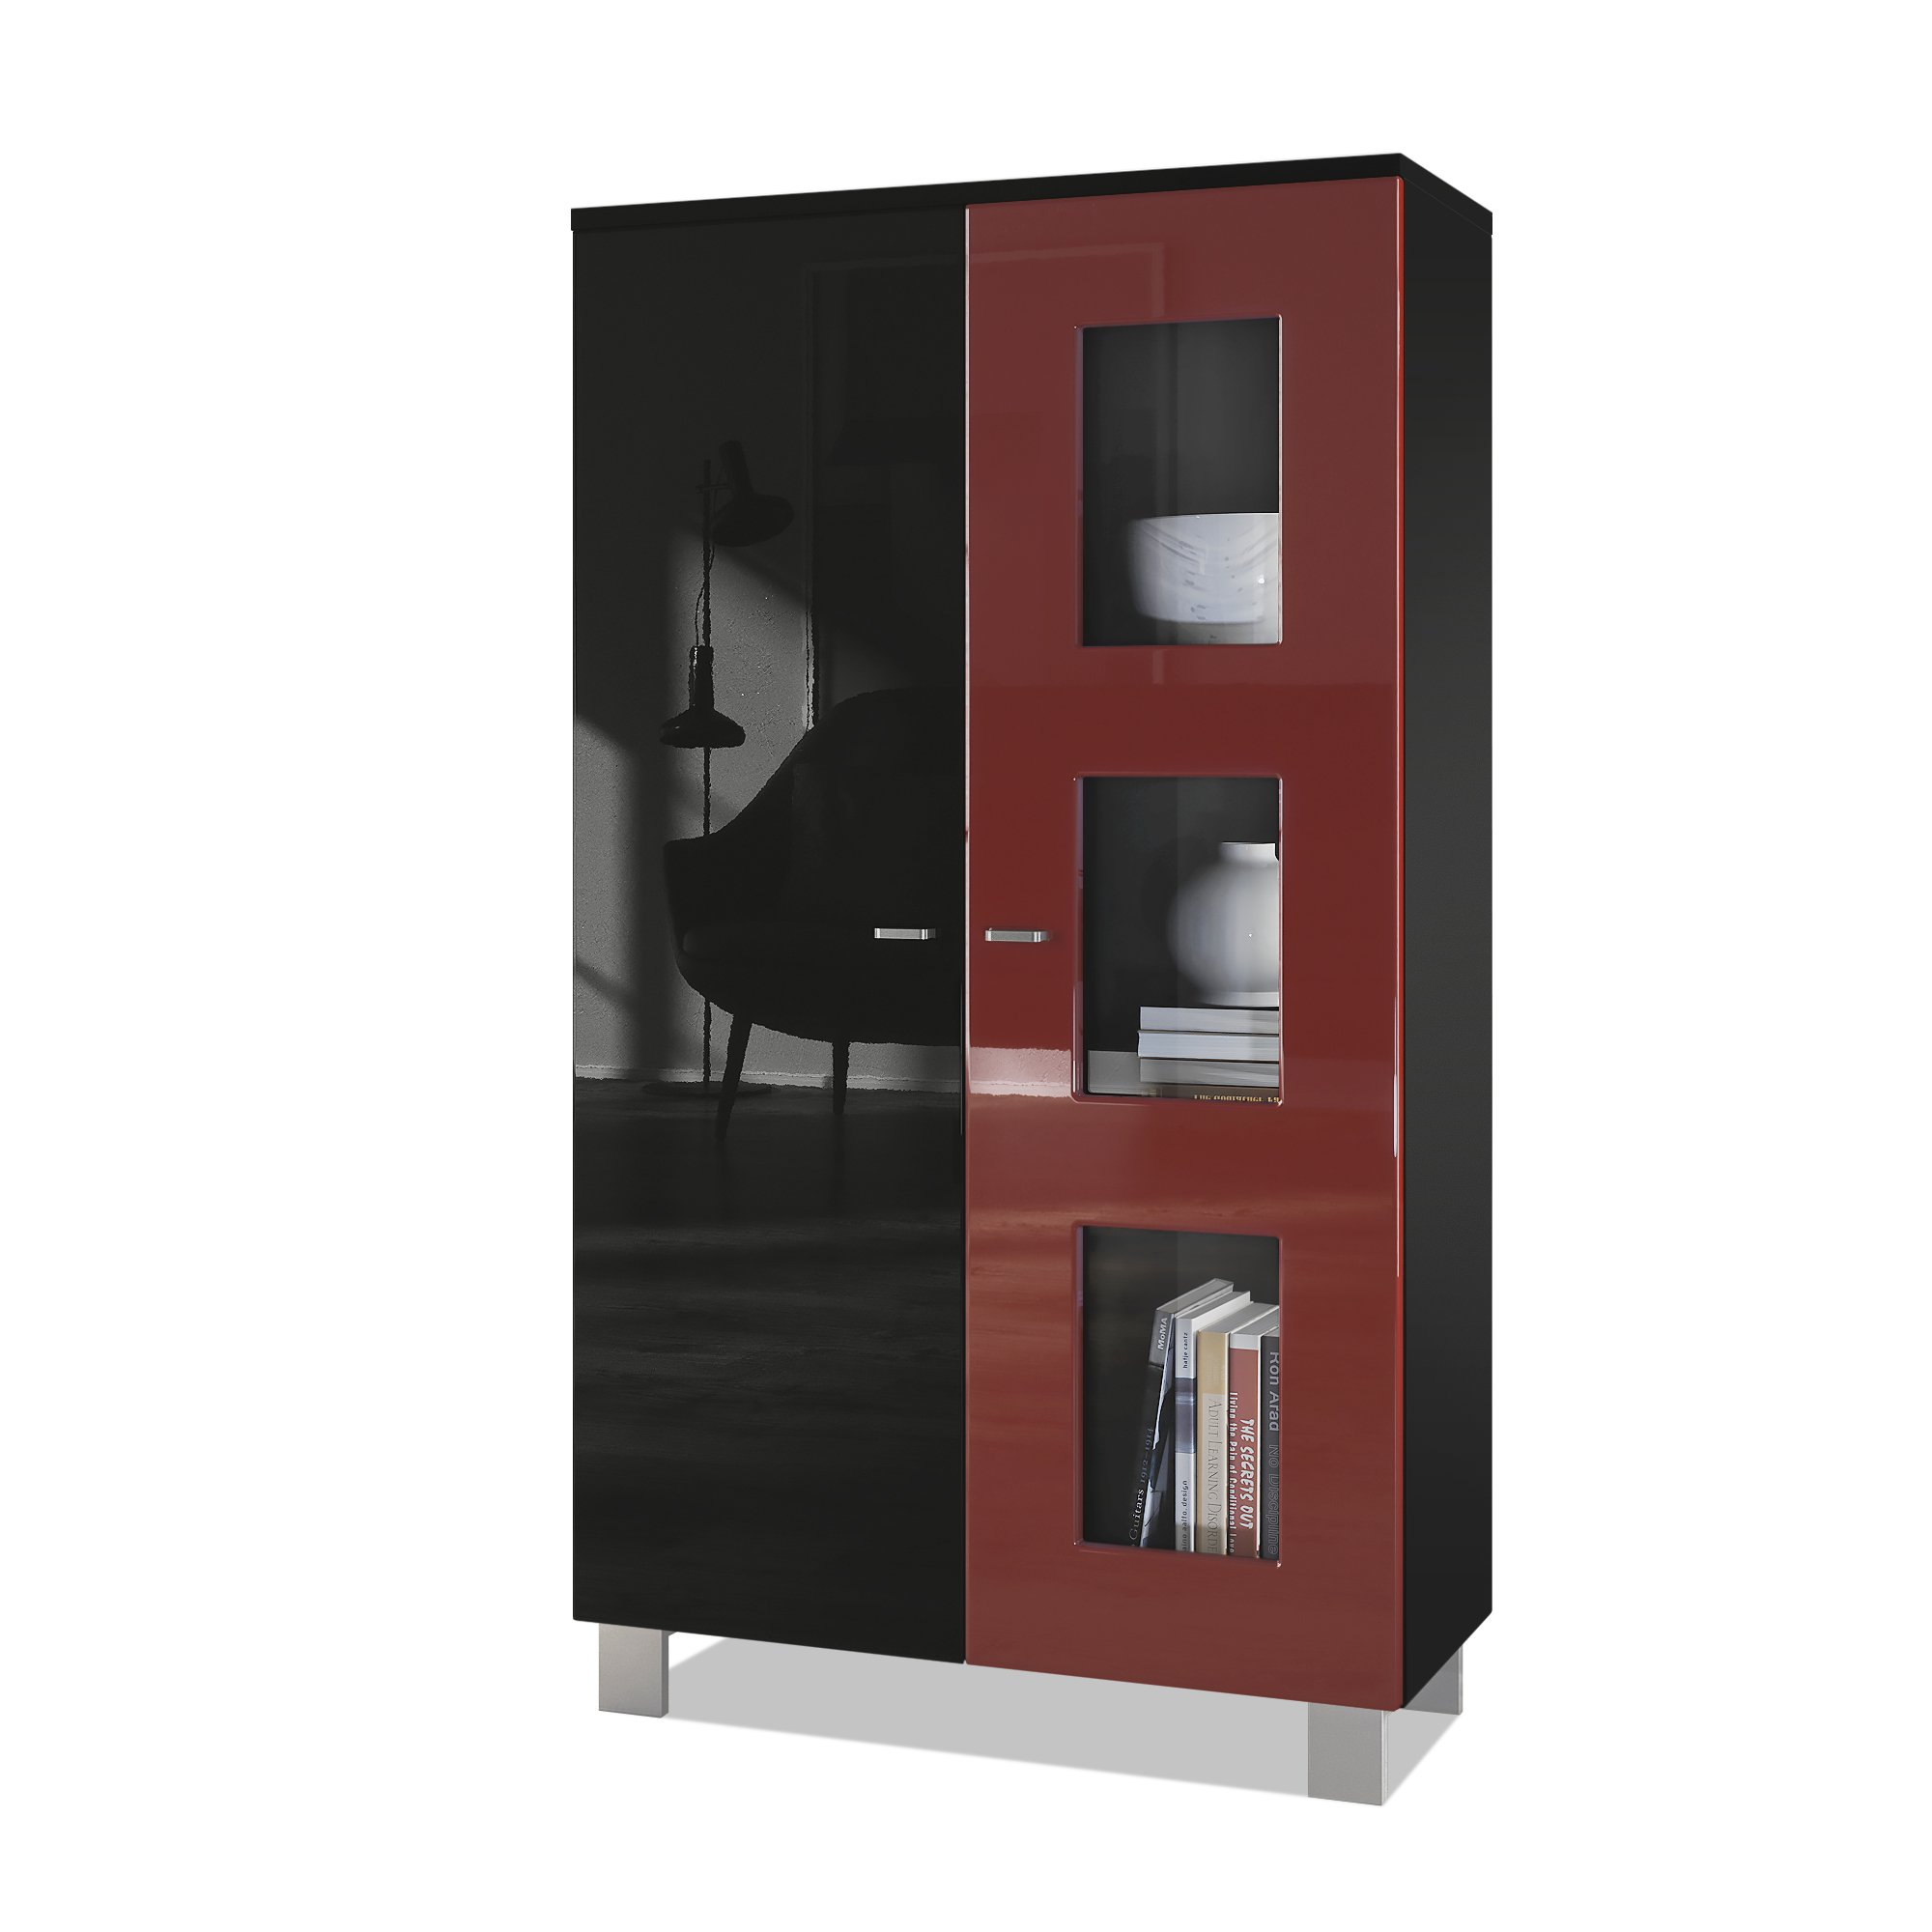 Vladon Tall Display Cabinet Cupboard Denjo, Carcass in Black matt/Front in Black High Gloss and Bordeaux High Gloss